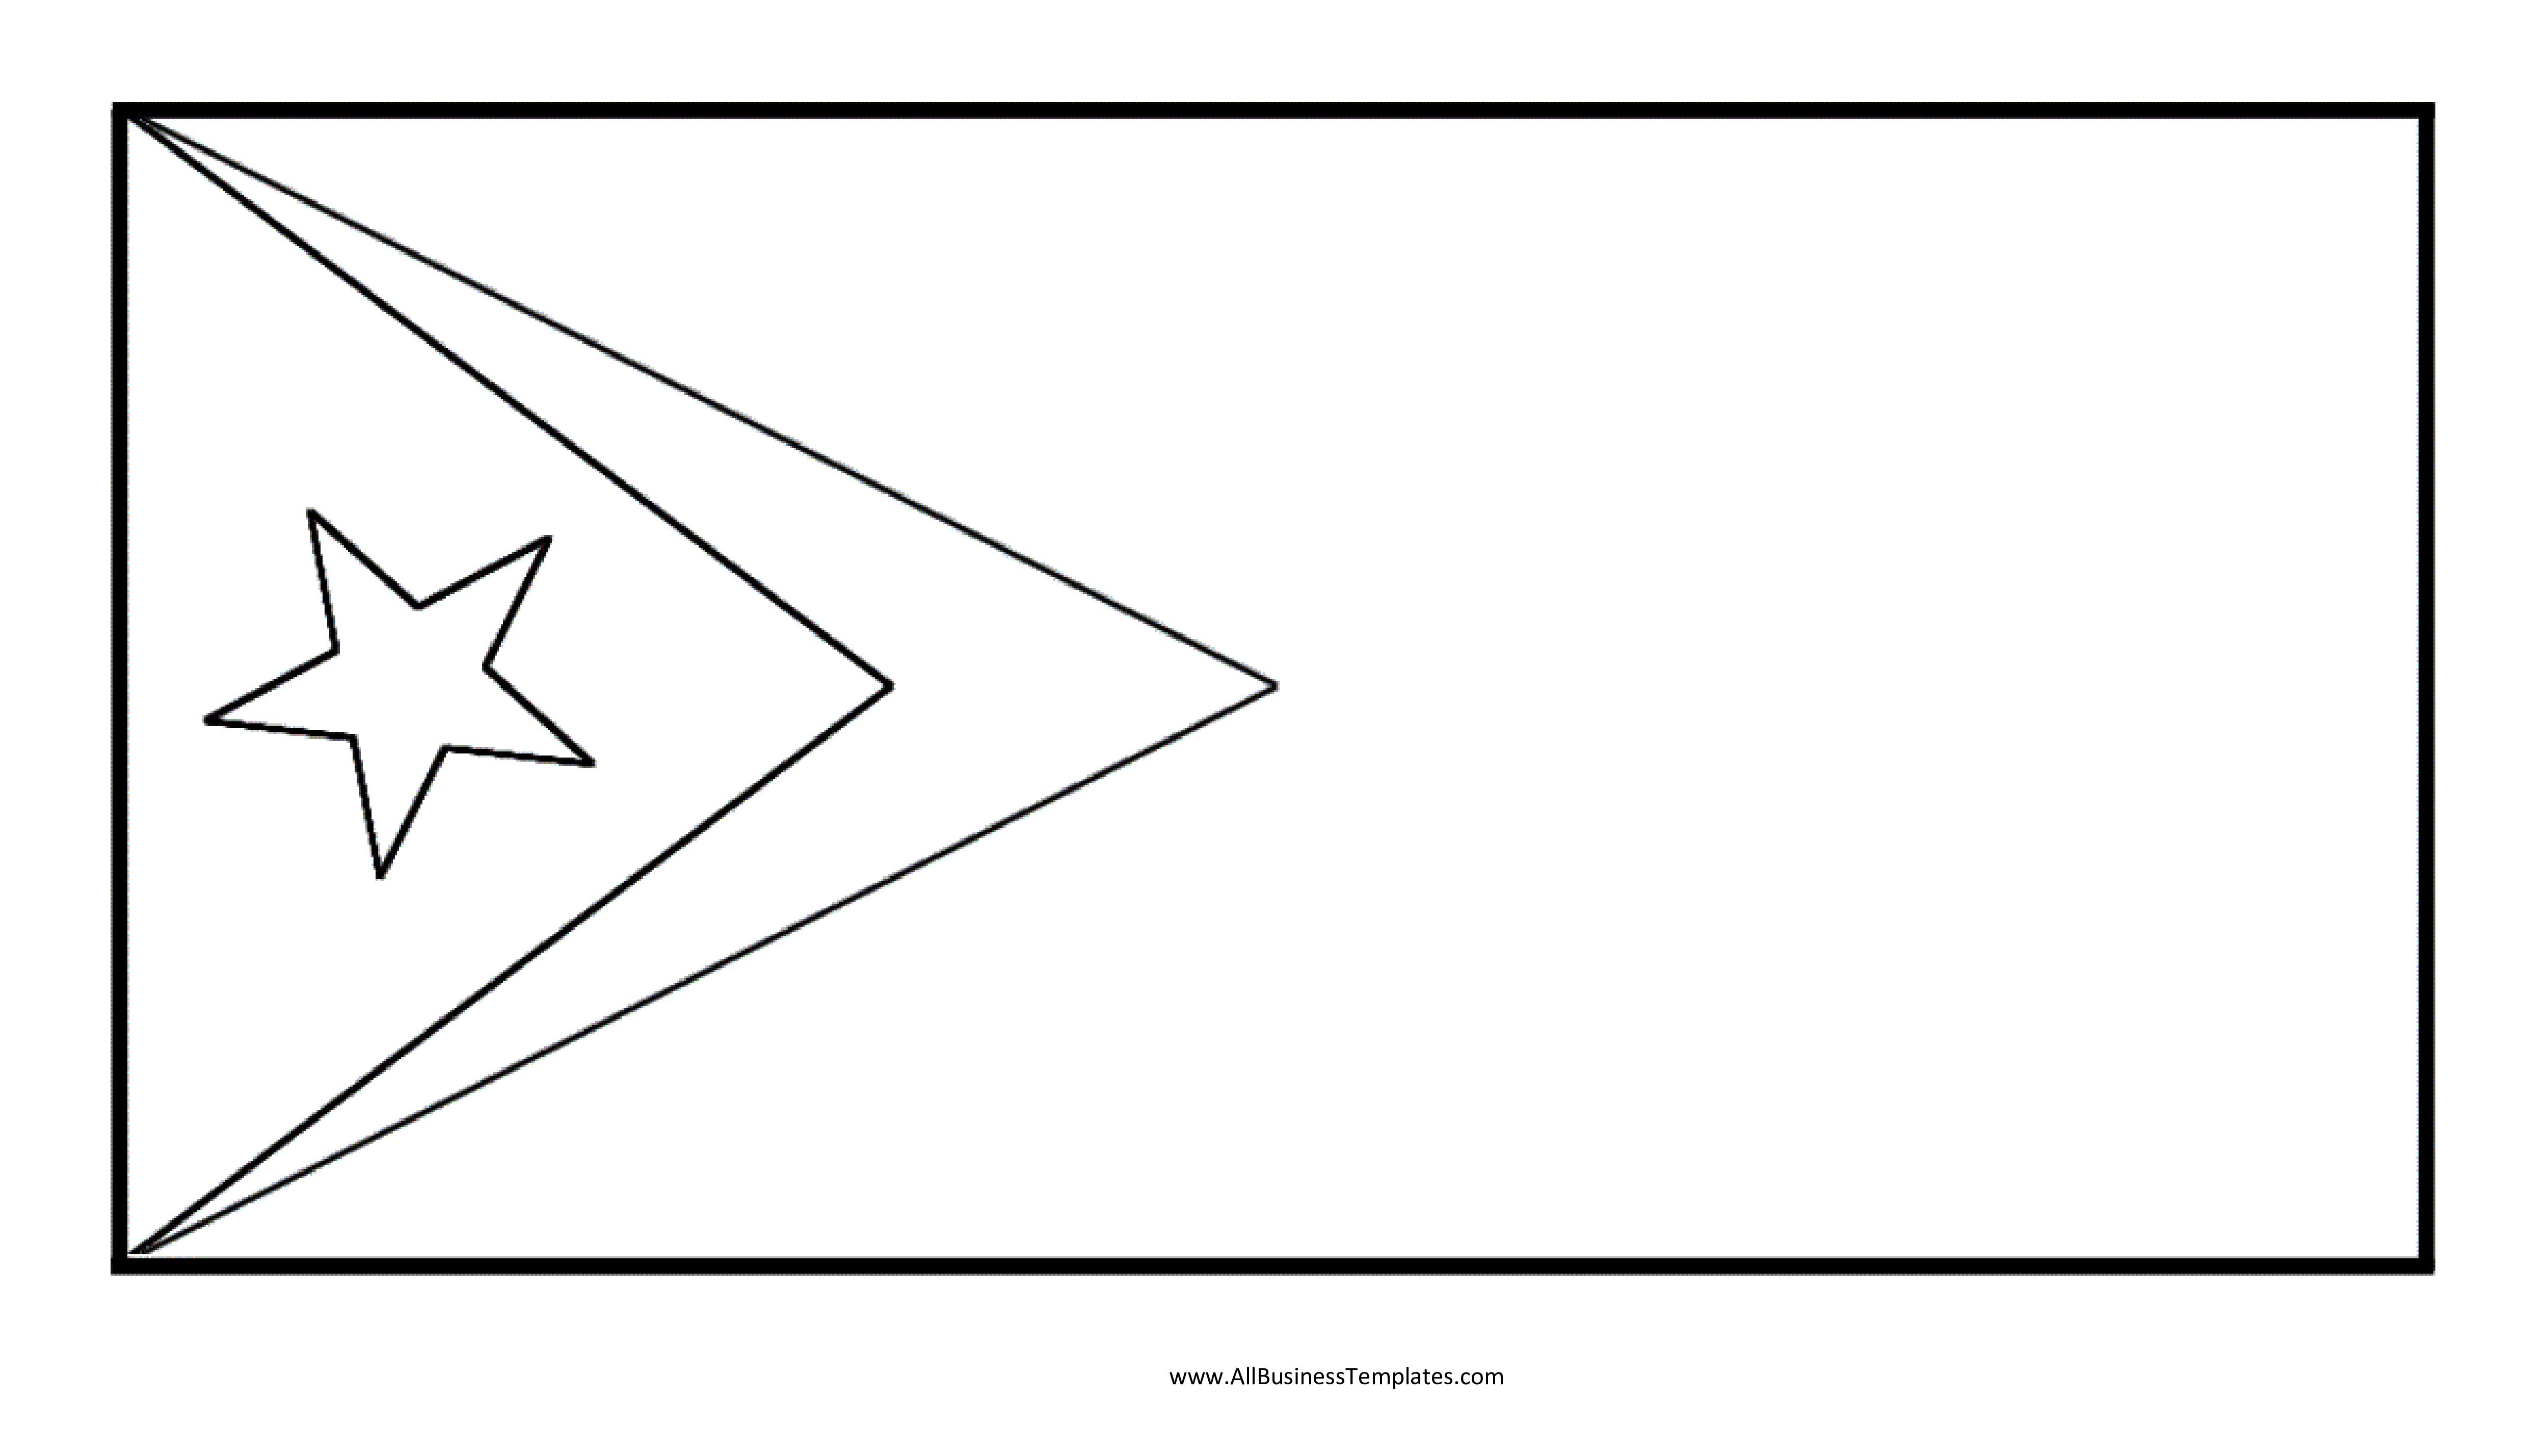 Free East Timor Printable Flag   Templates At Allbusinesstemplates - Free Printable Blank Flag Template